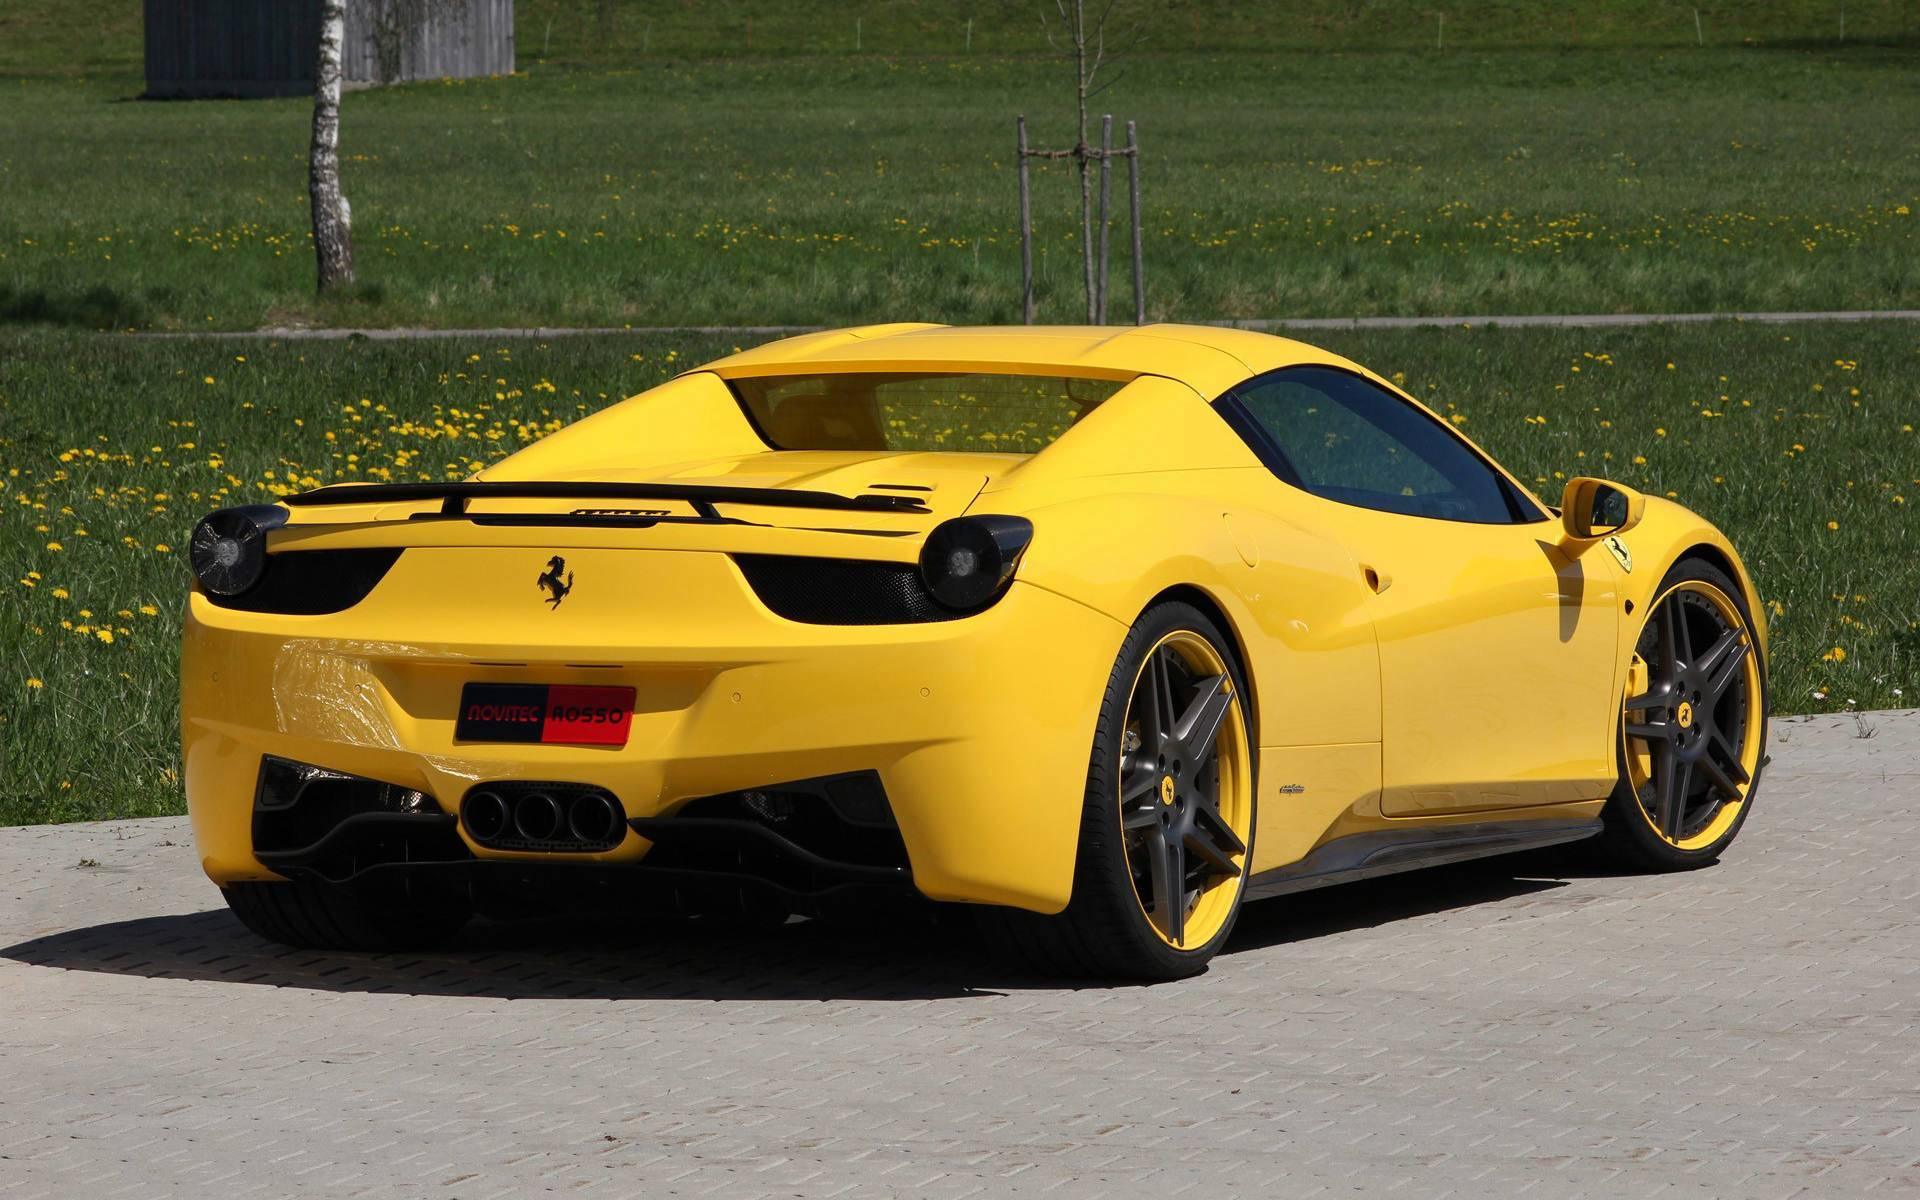 vehicle yellow sports car -#main